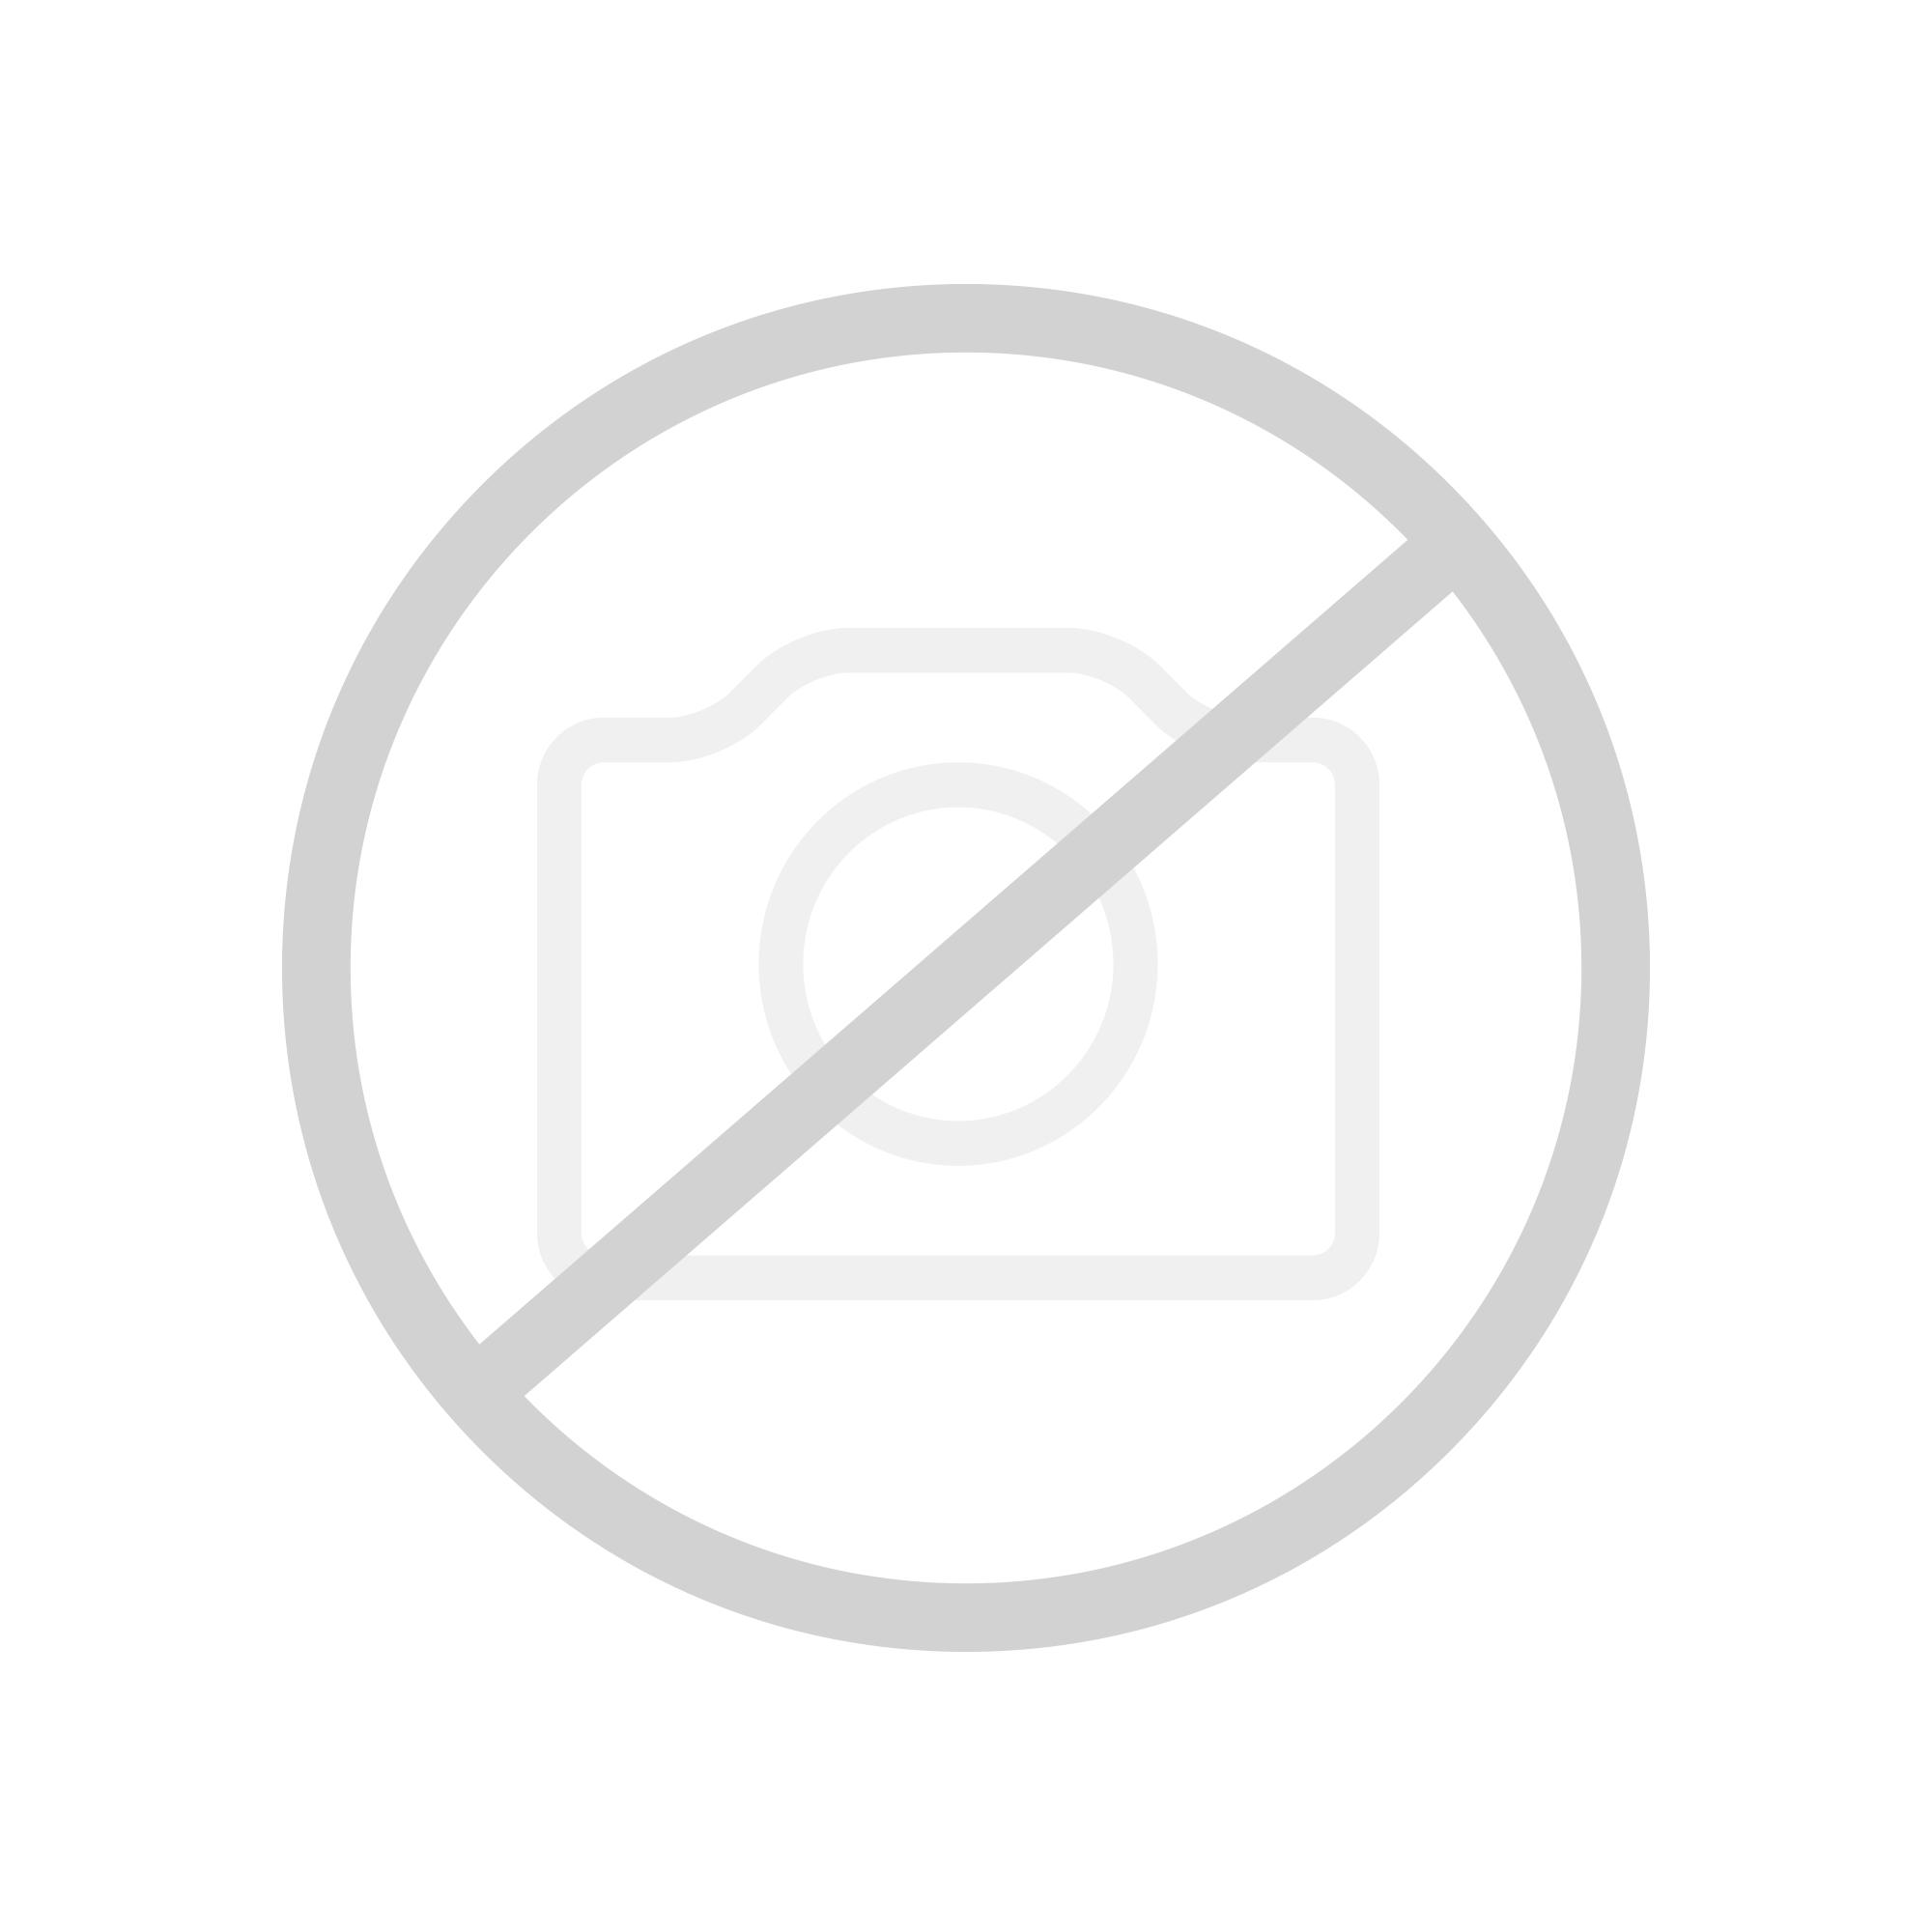 Hansgrohe Raindance Select E 360 1jet Showerpipe, EcoSmart chrom